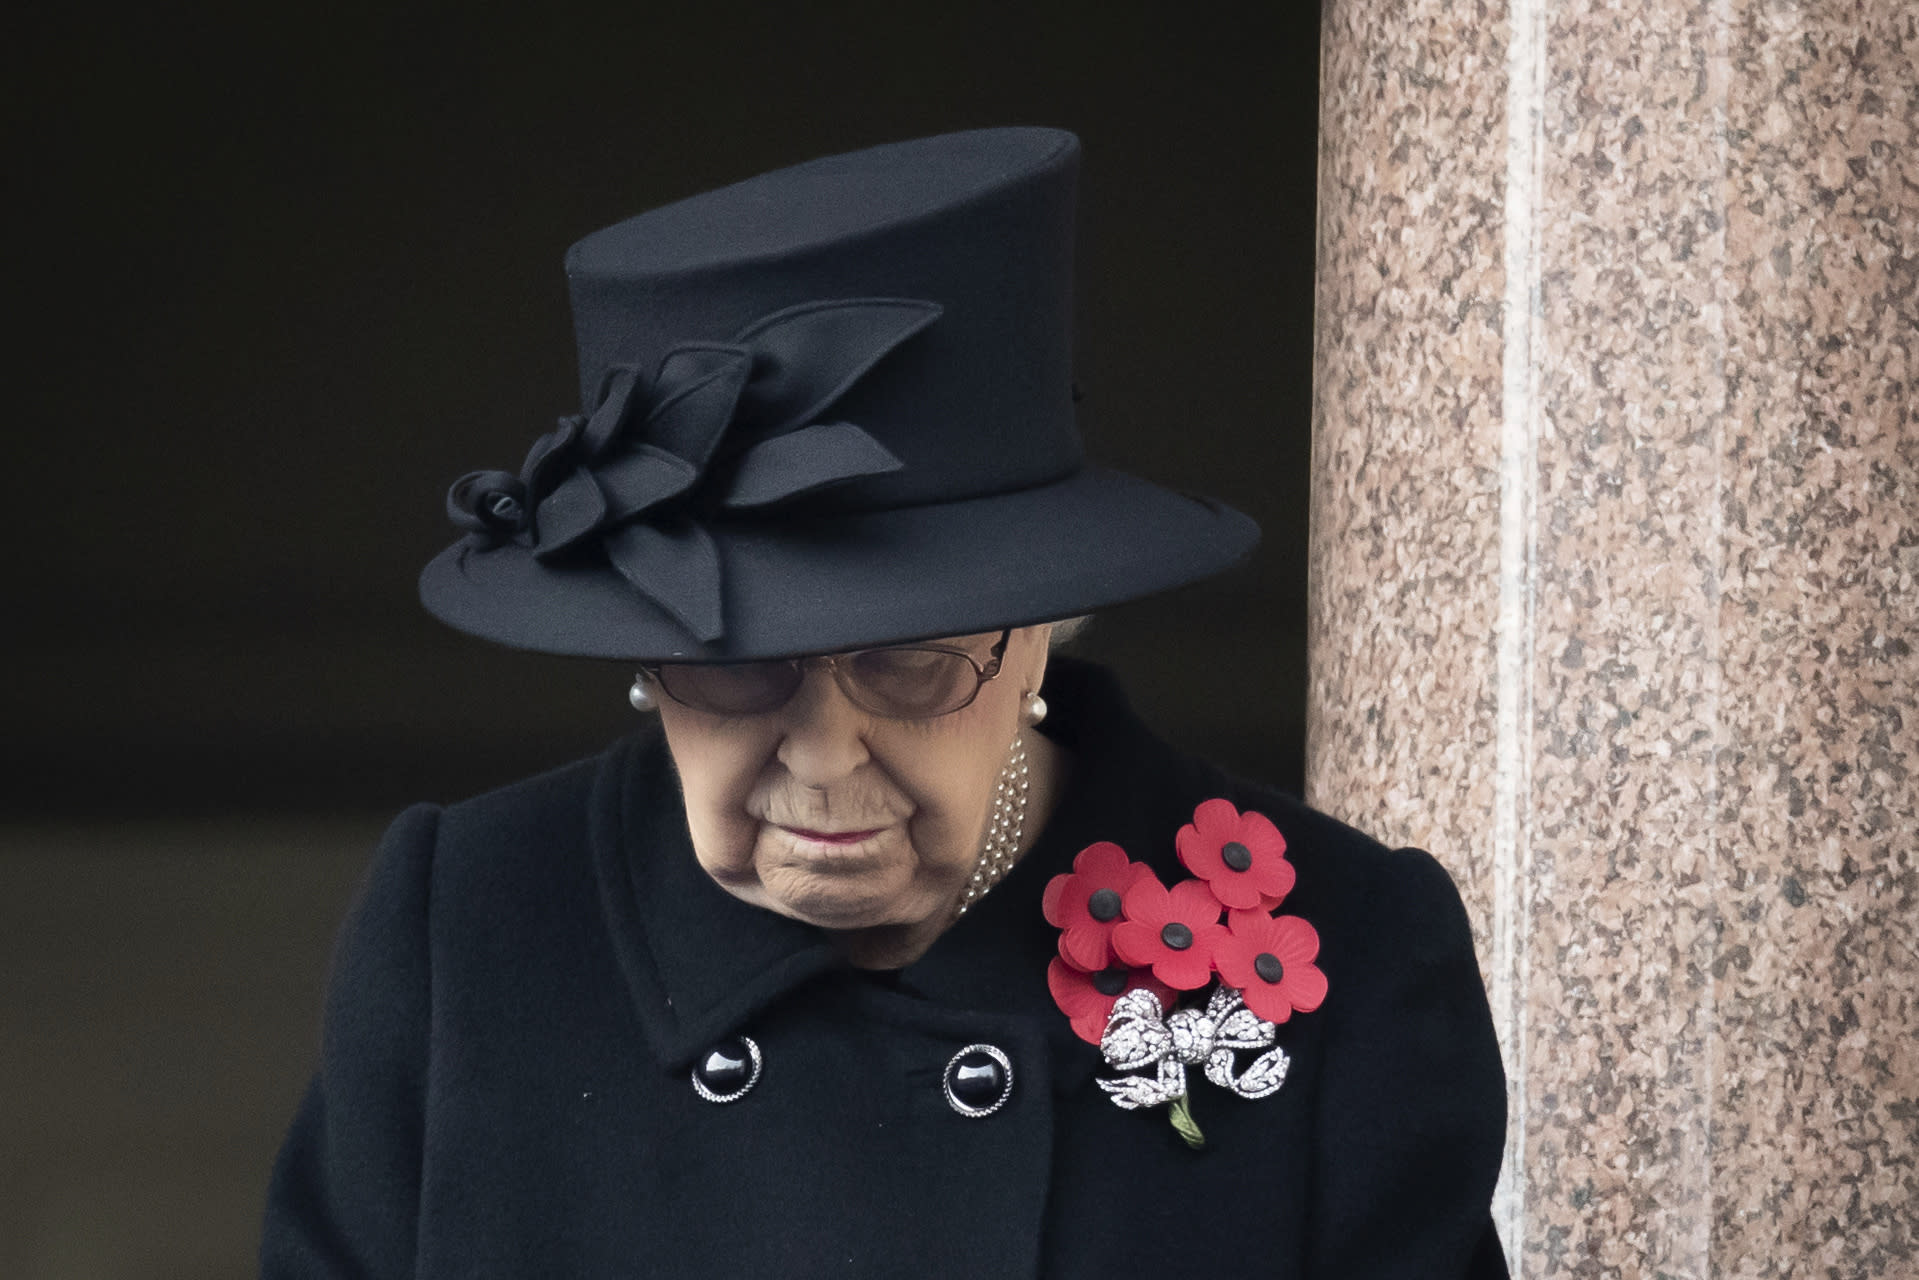 British queen offers condolences to Eta storm victims